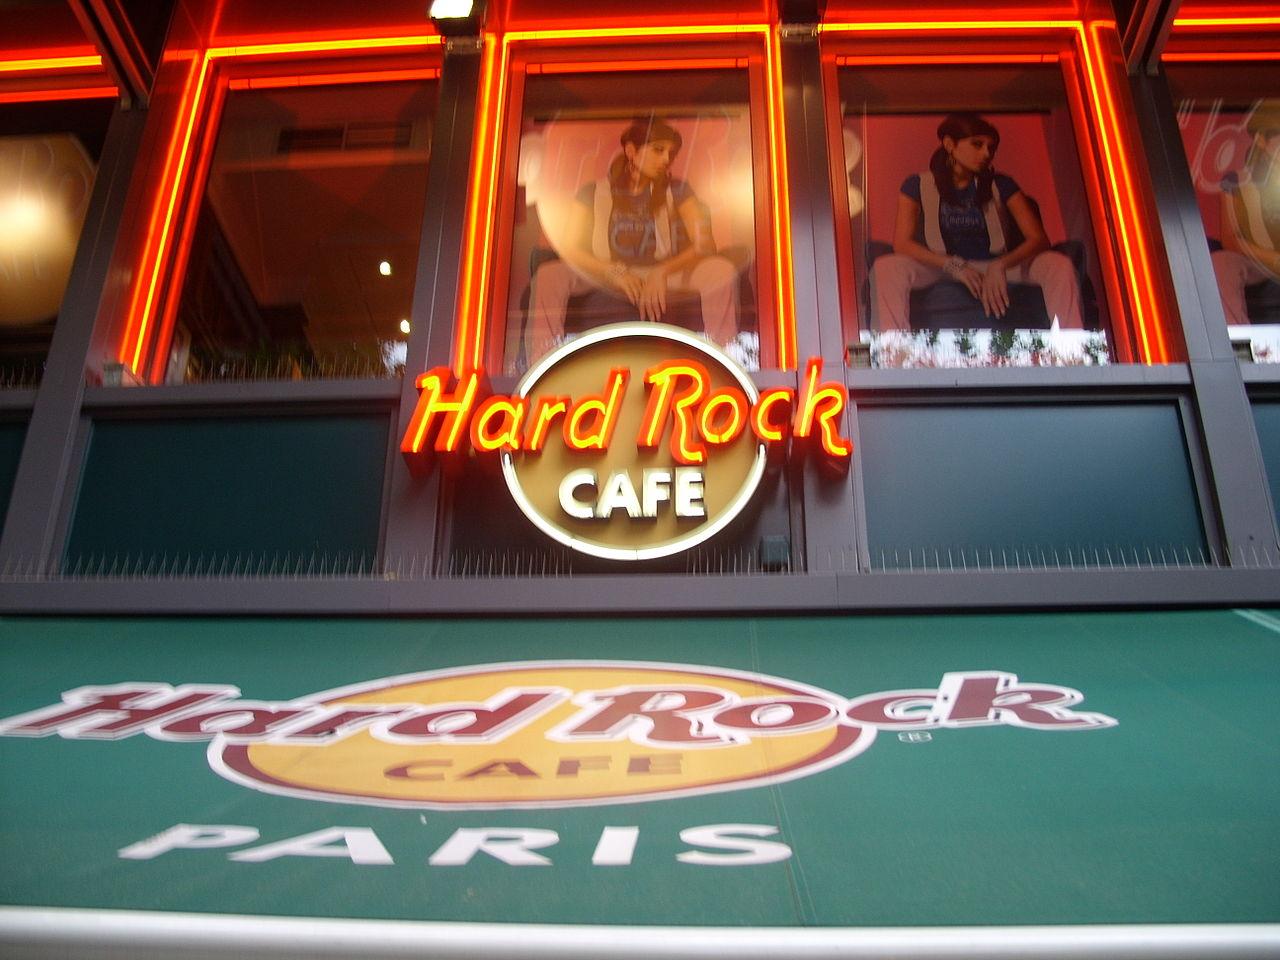 Hard Rock Cafe Bilbao